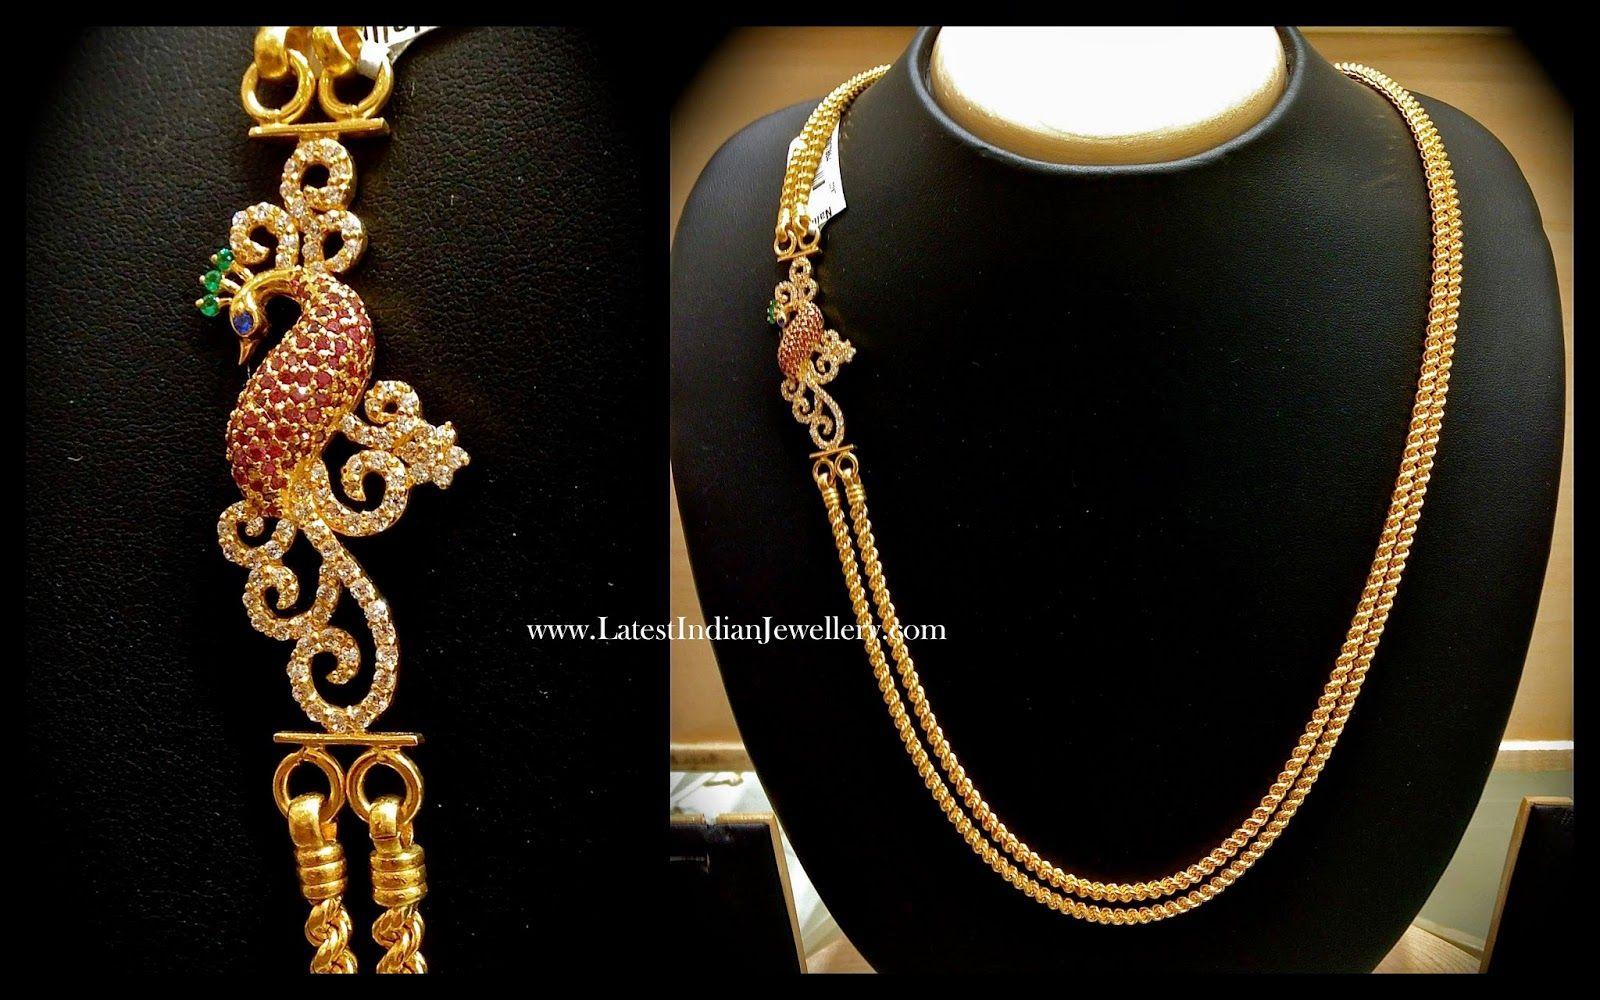 Peacock Design Mugappu Gold Chain | mukthi | Pinterest ...